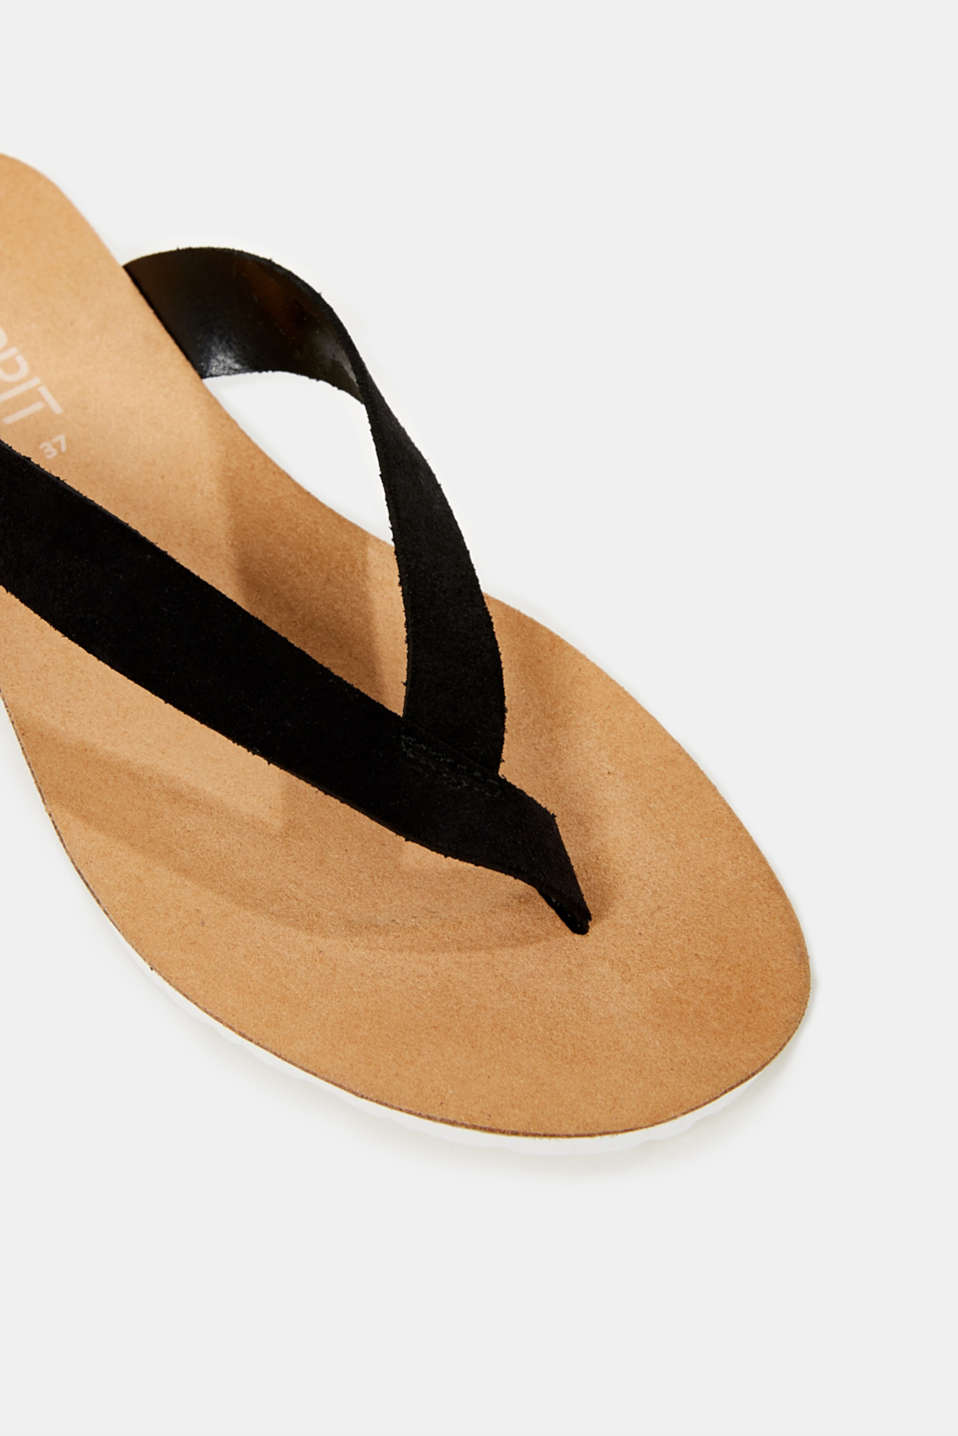 Leather toe-post slip-ons, BLACK, detail image number 4